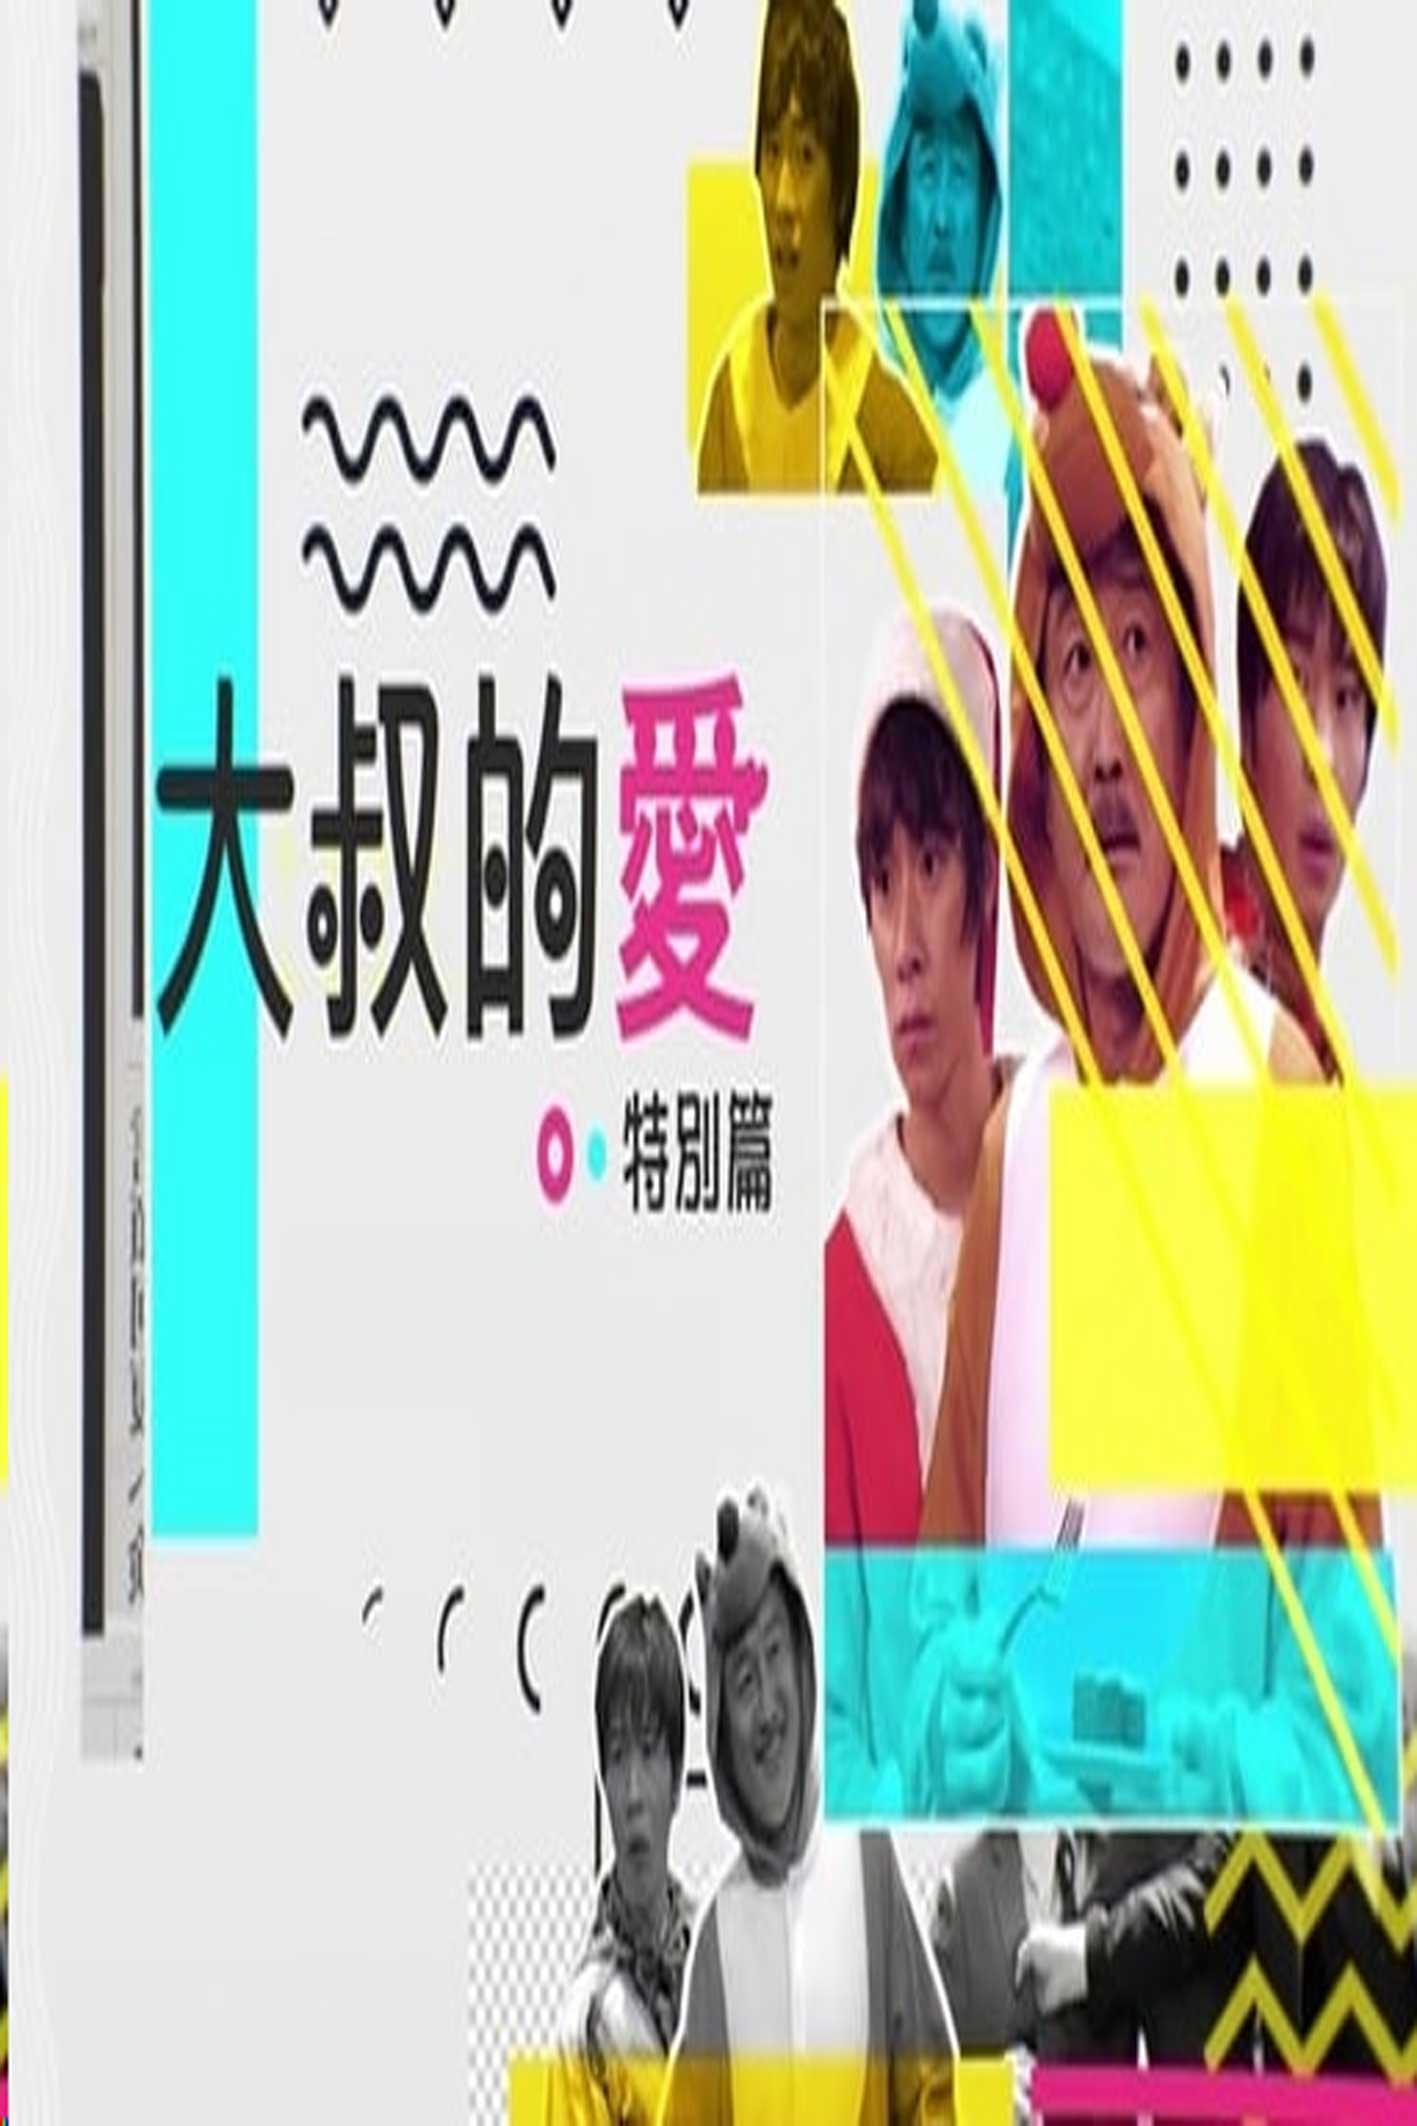 Ossan's Love 2016 (Cantonese) - 大叔的愛 特別篇